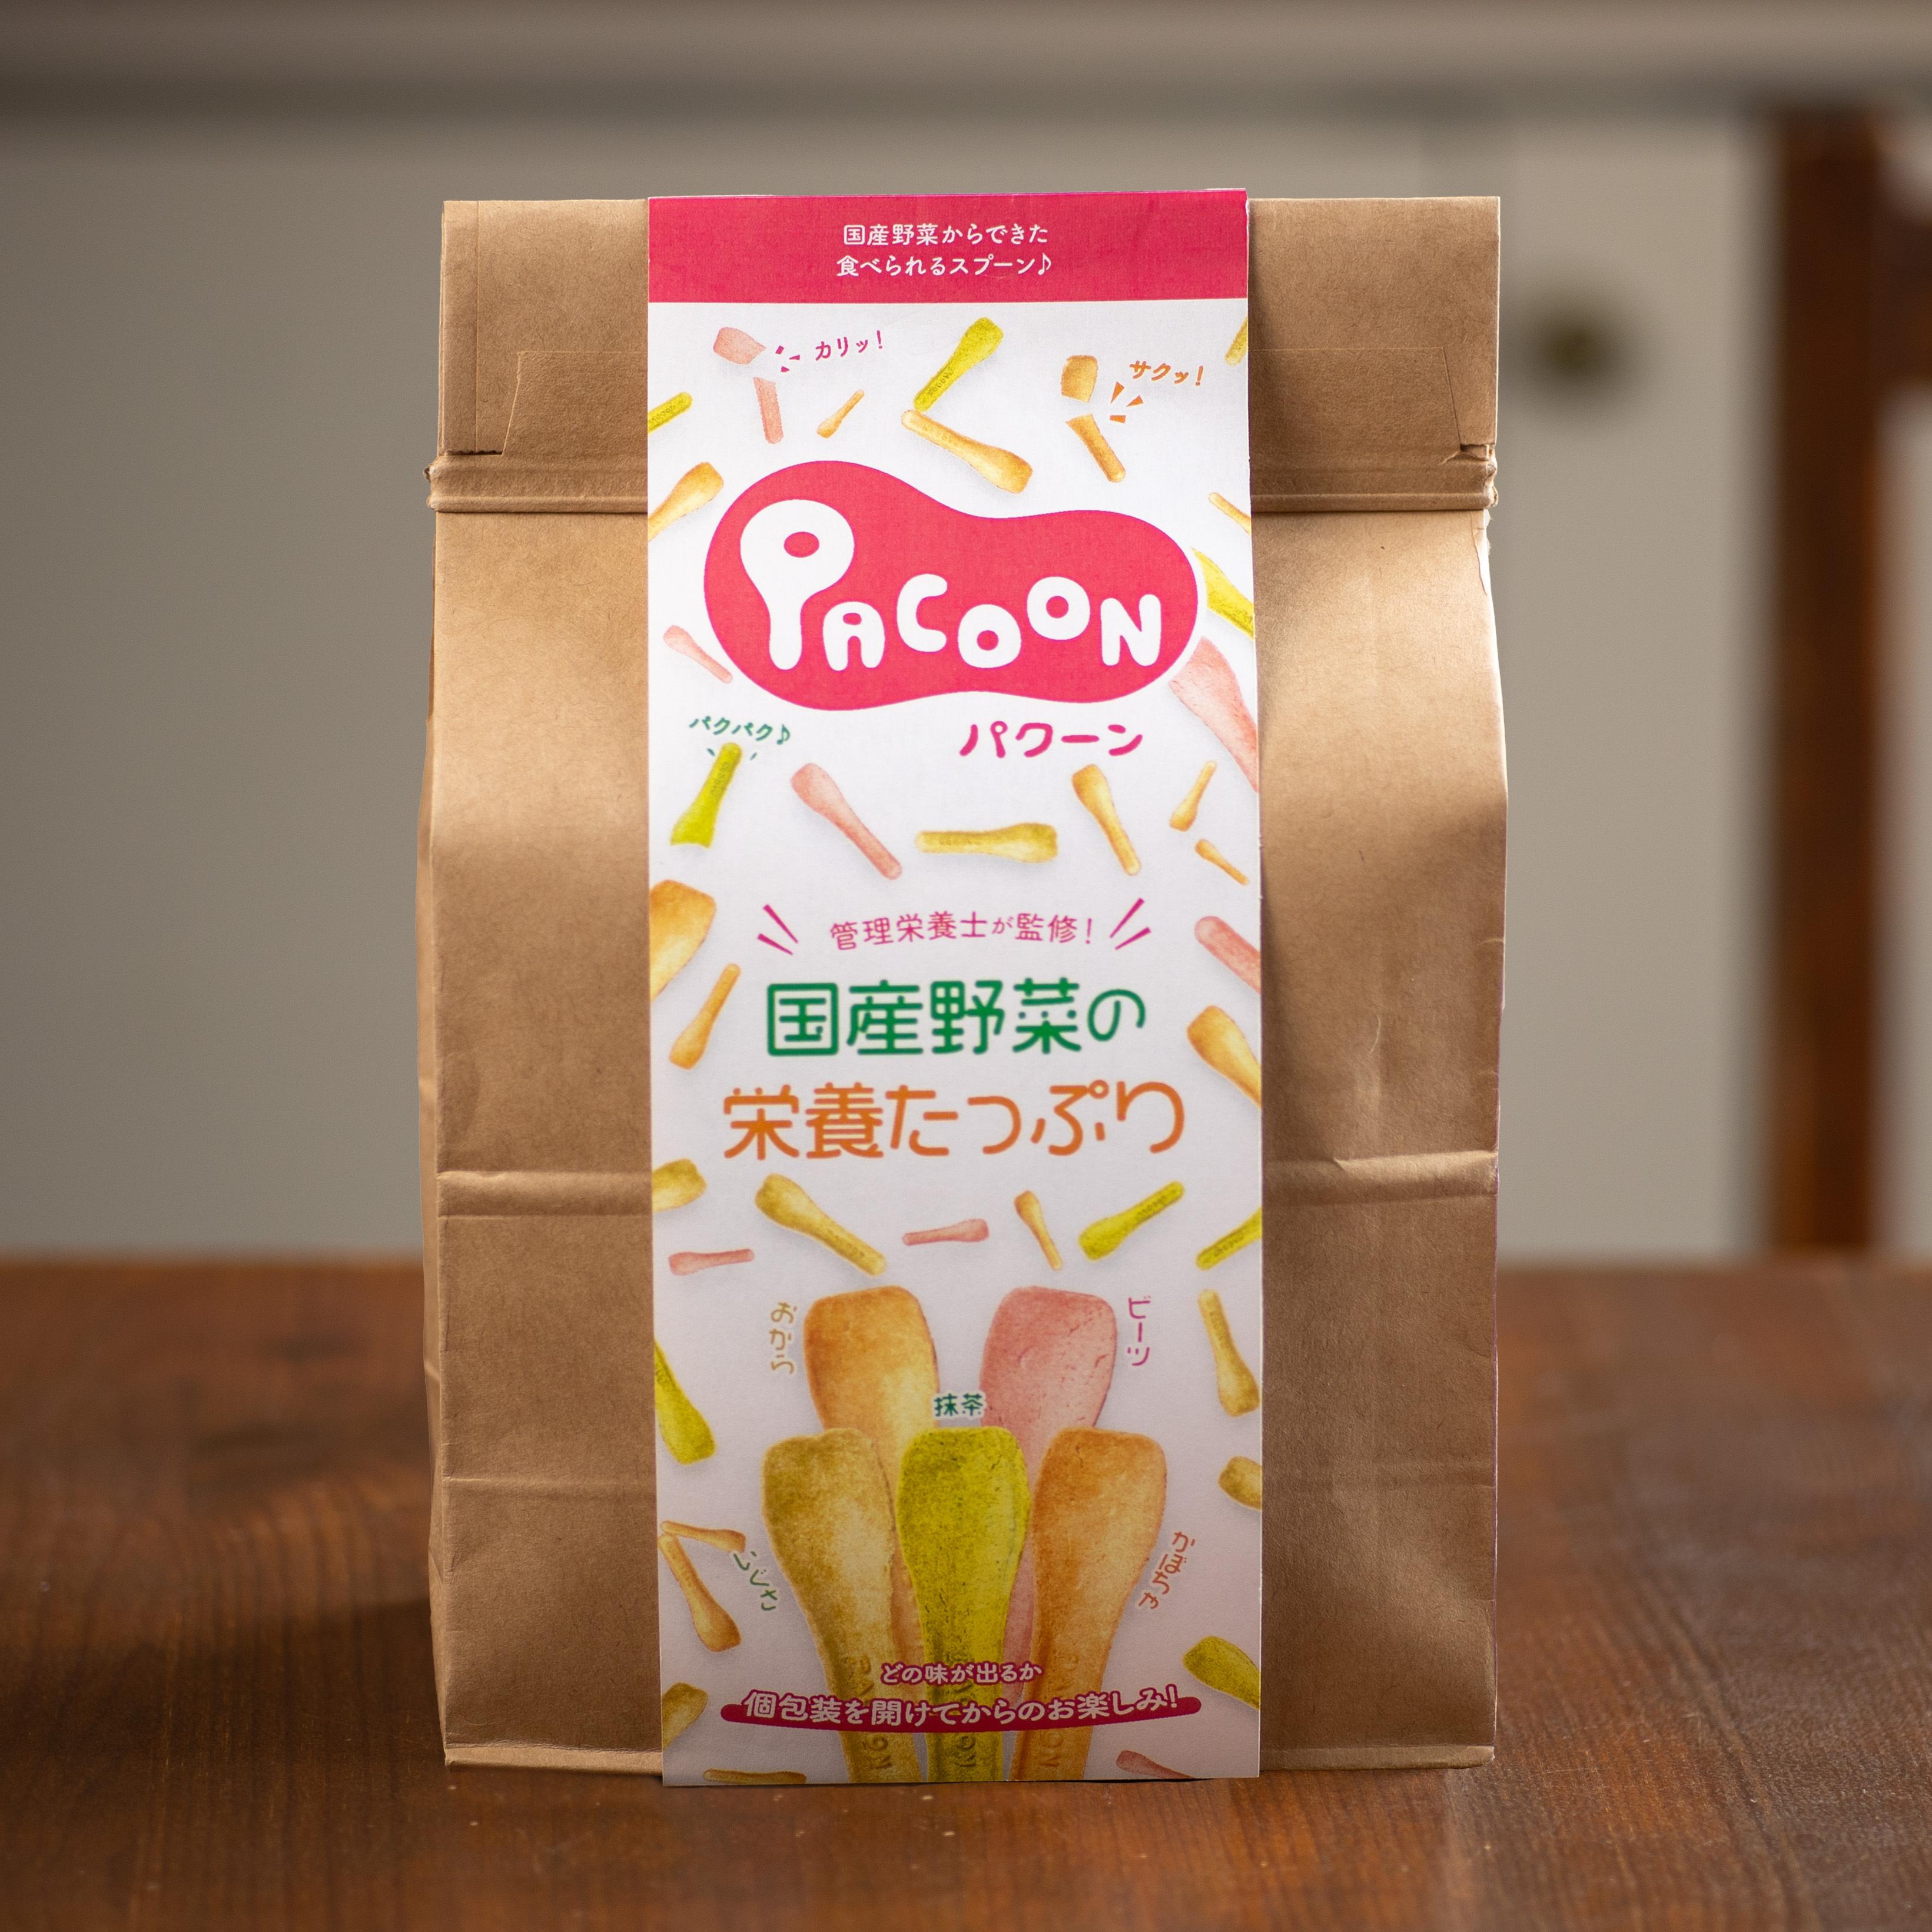 PACOON 5種ミックス (50本入)    発売記念価格